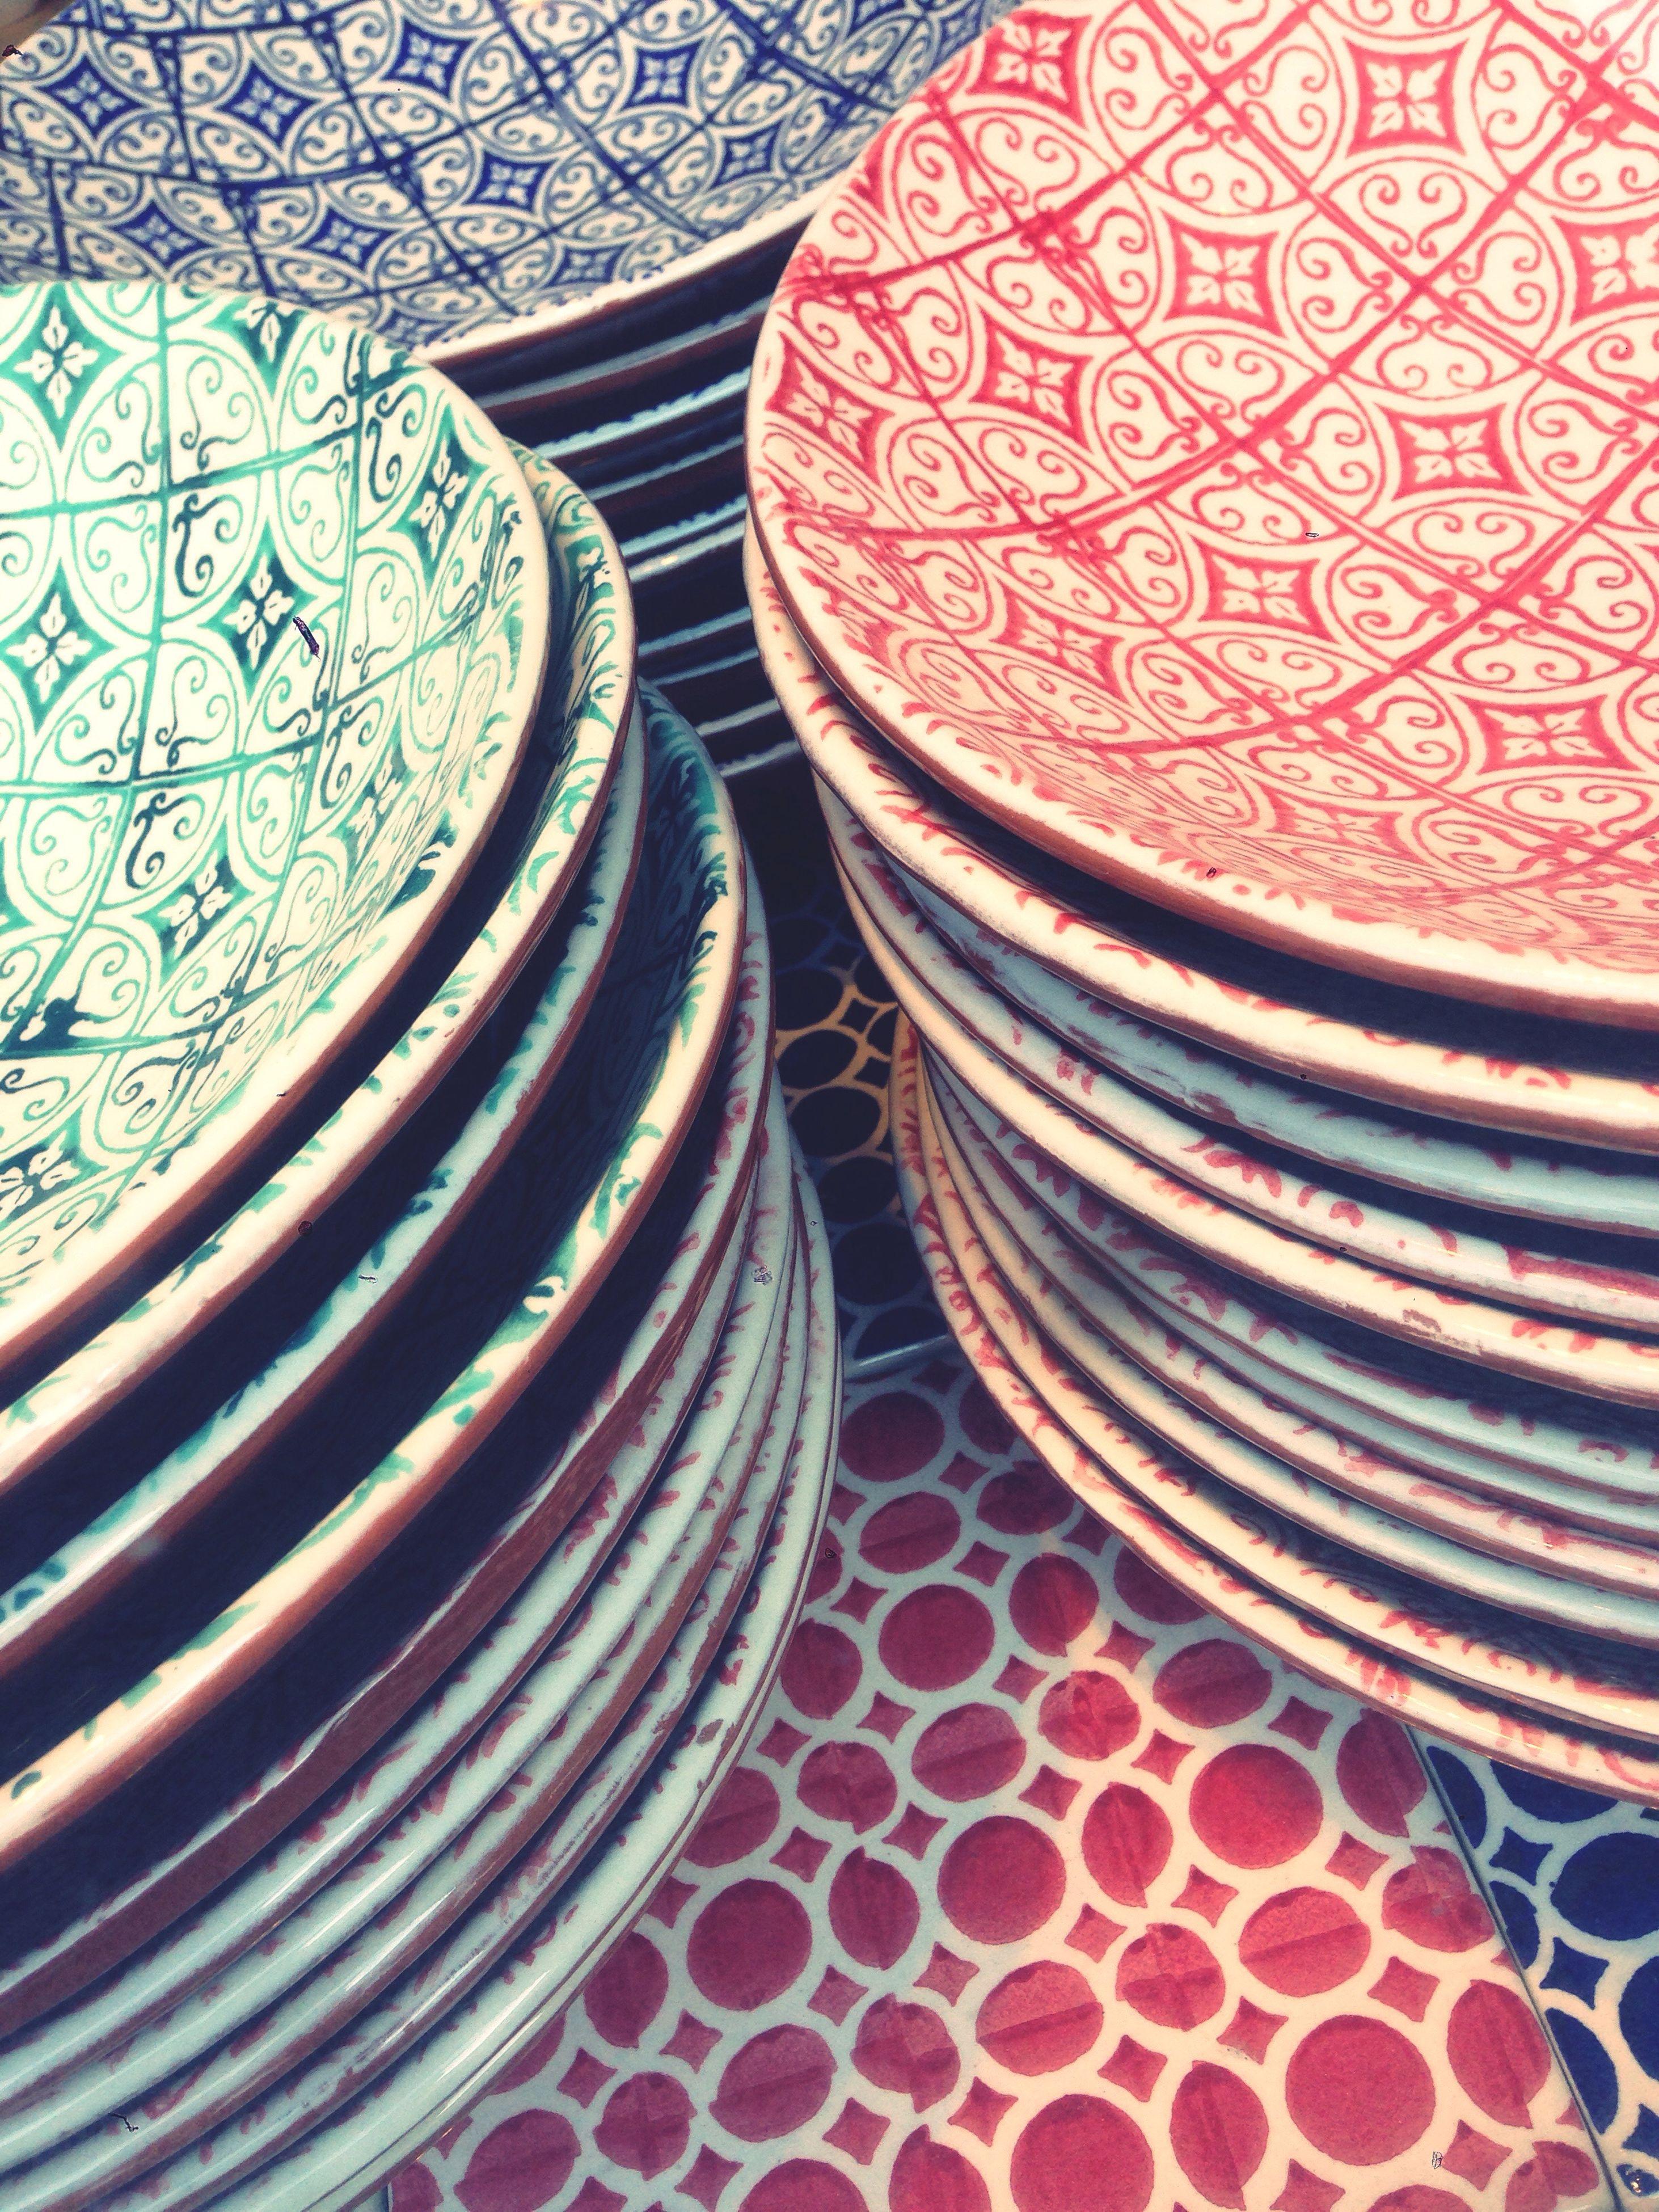 pattern, design, close-up, no people